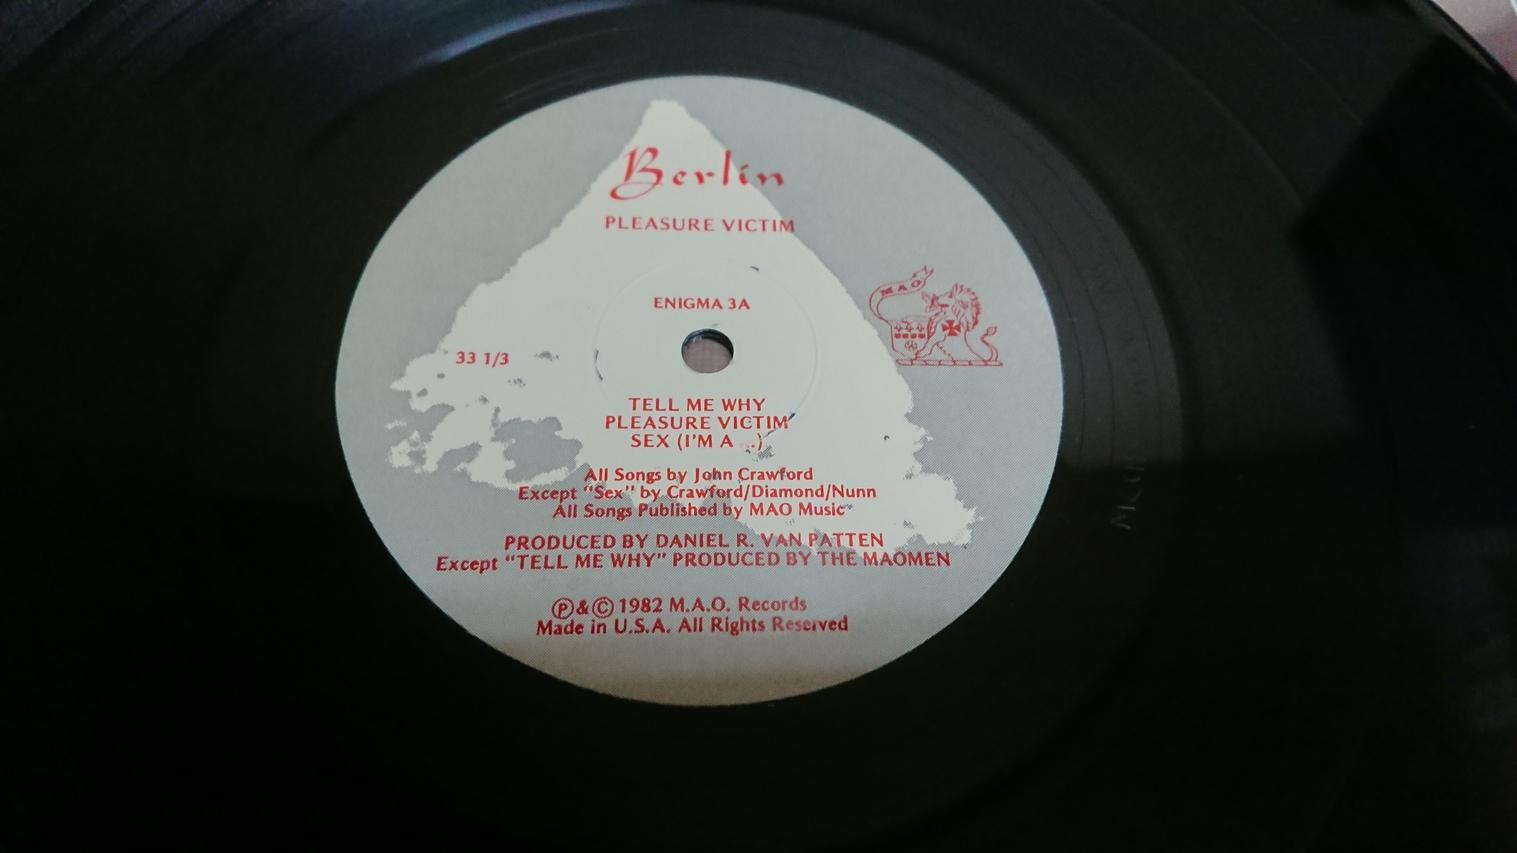 Berlin / Pleasure Victim-1982